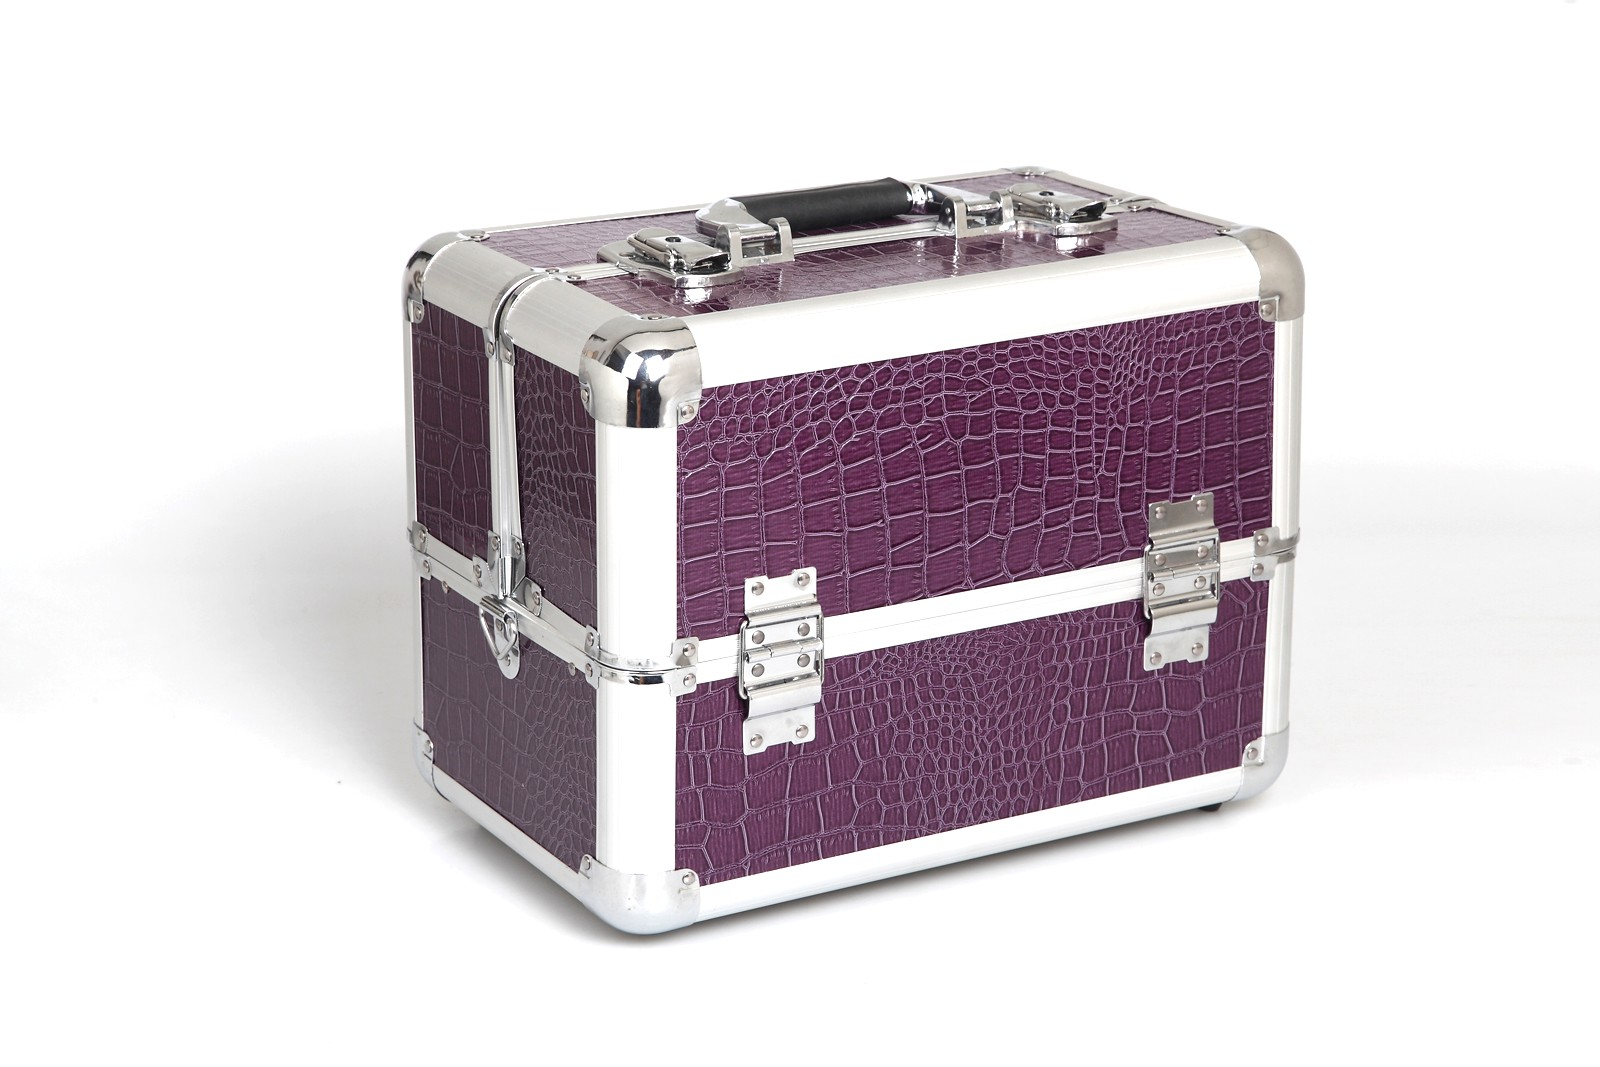 kosmetikkoffer kompakt lila croco design rund stuttgart. Black Bedroom Furniture Sets. Home Design Ideas